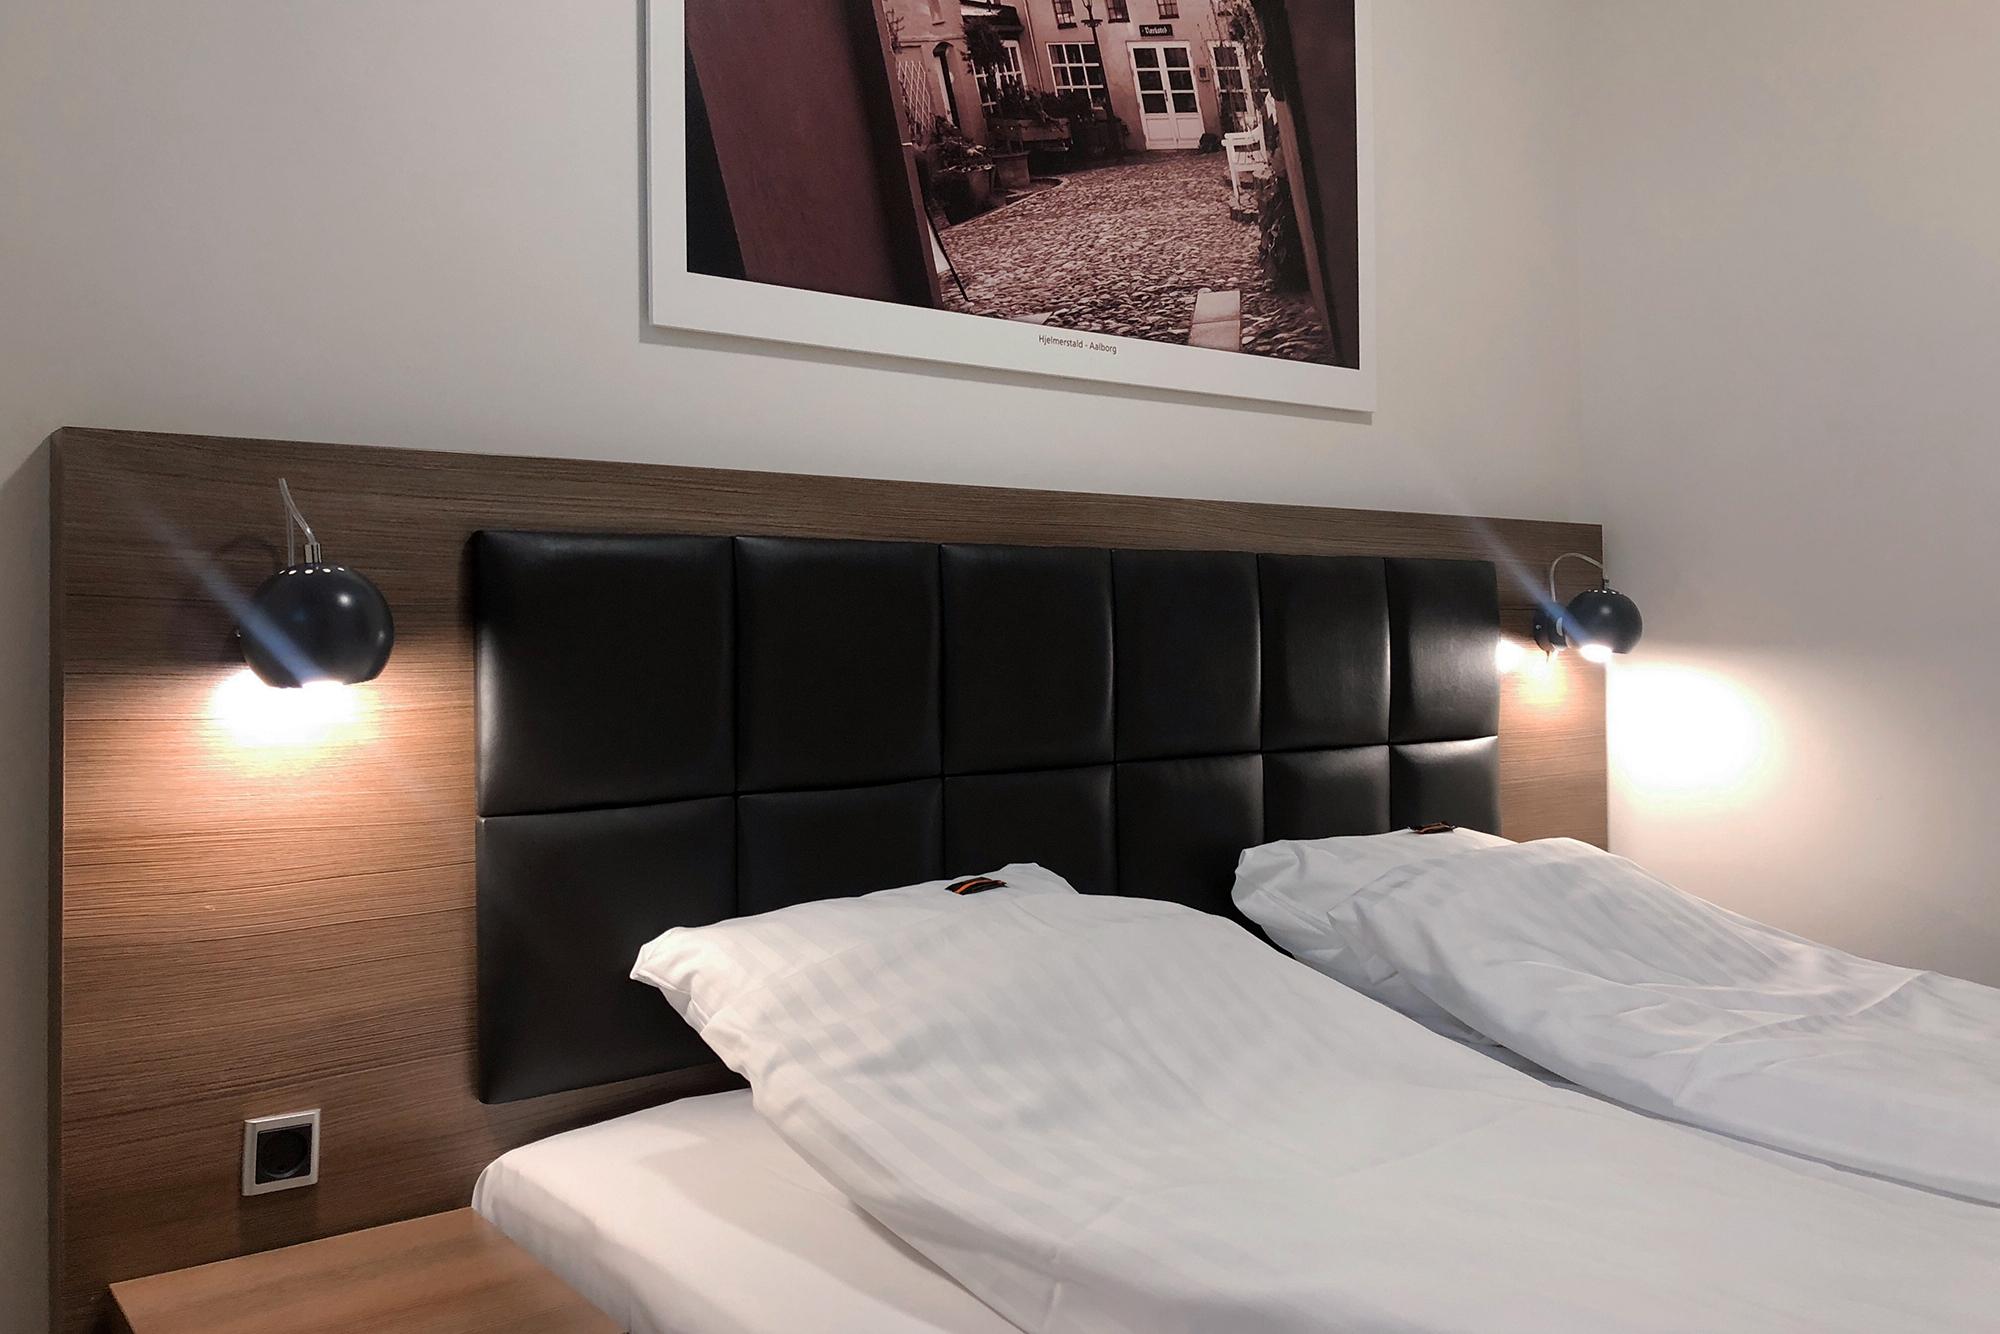 Double room 4 - window fit